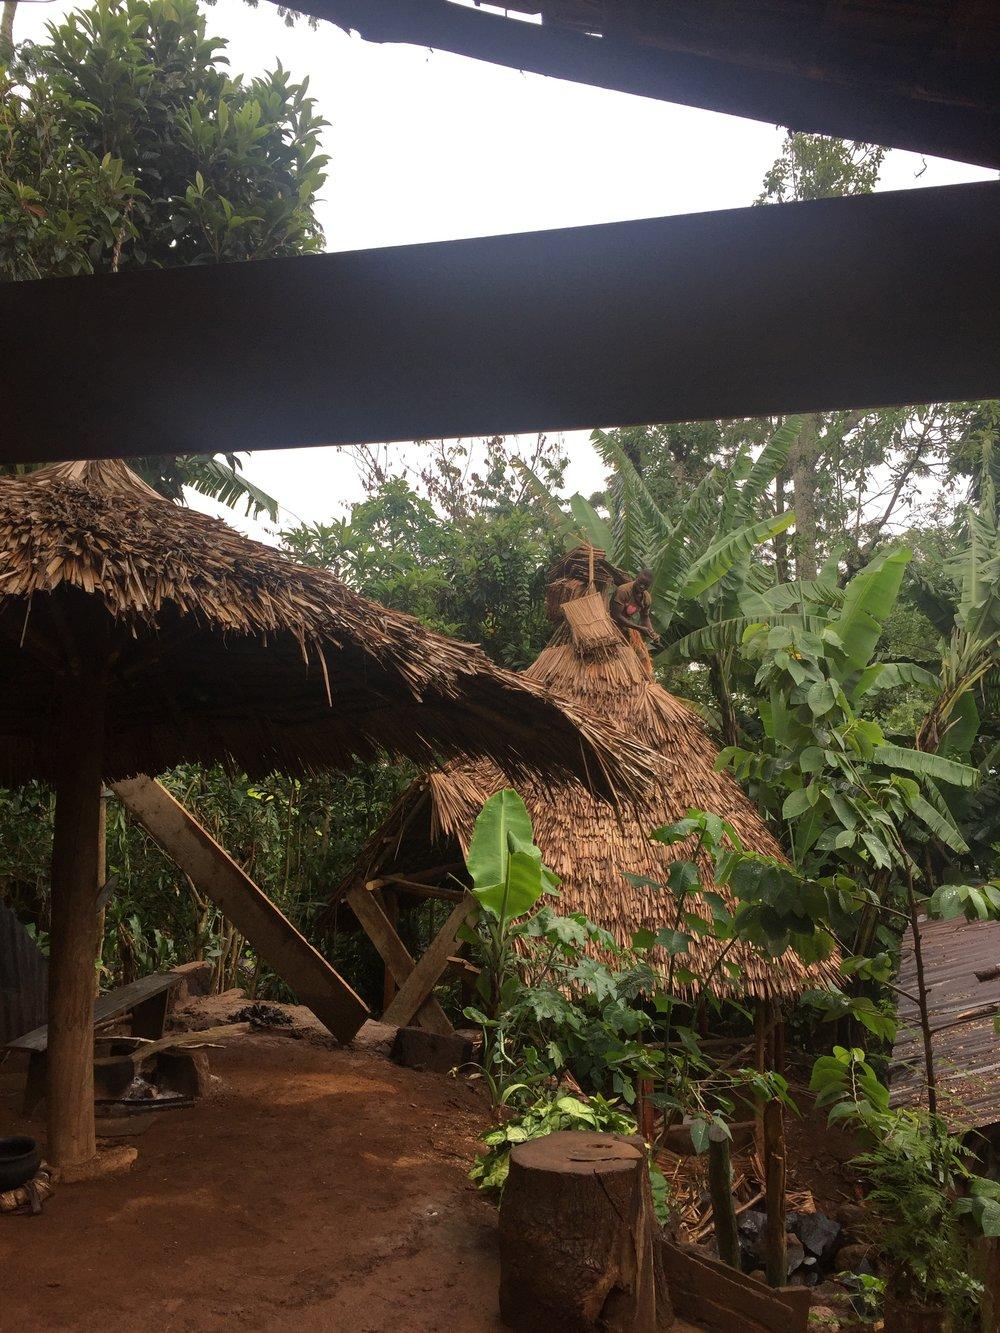 Coffee Farm, Agriculture, Dar es Salaam, Tanzania